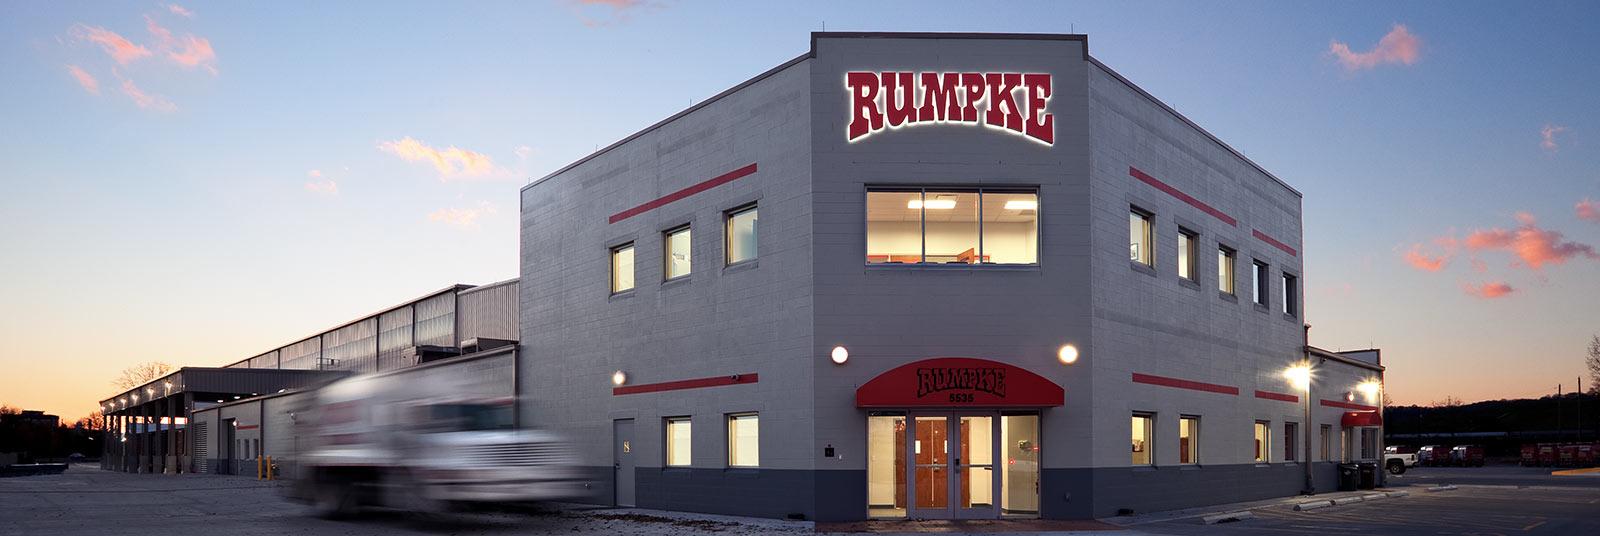 Rumpke_Photo-1